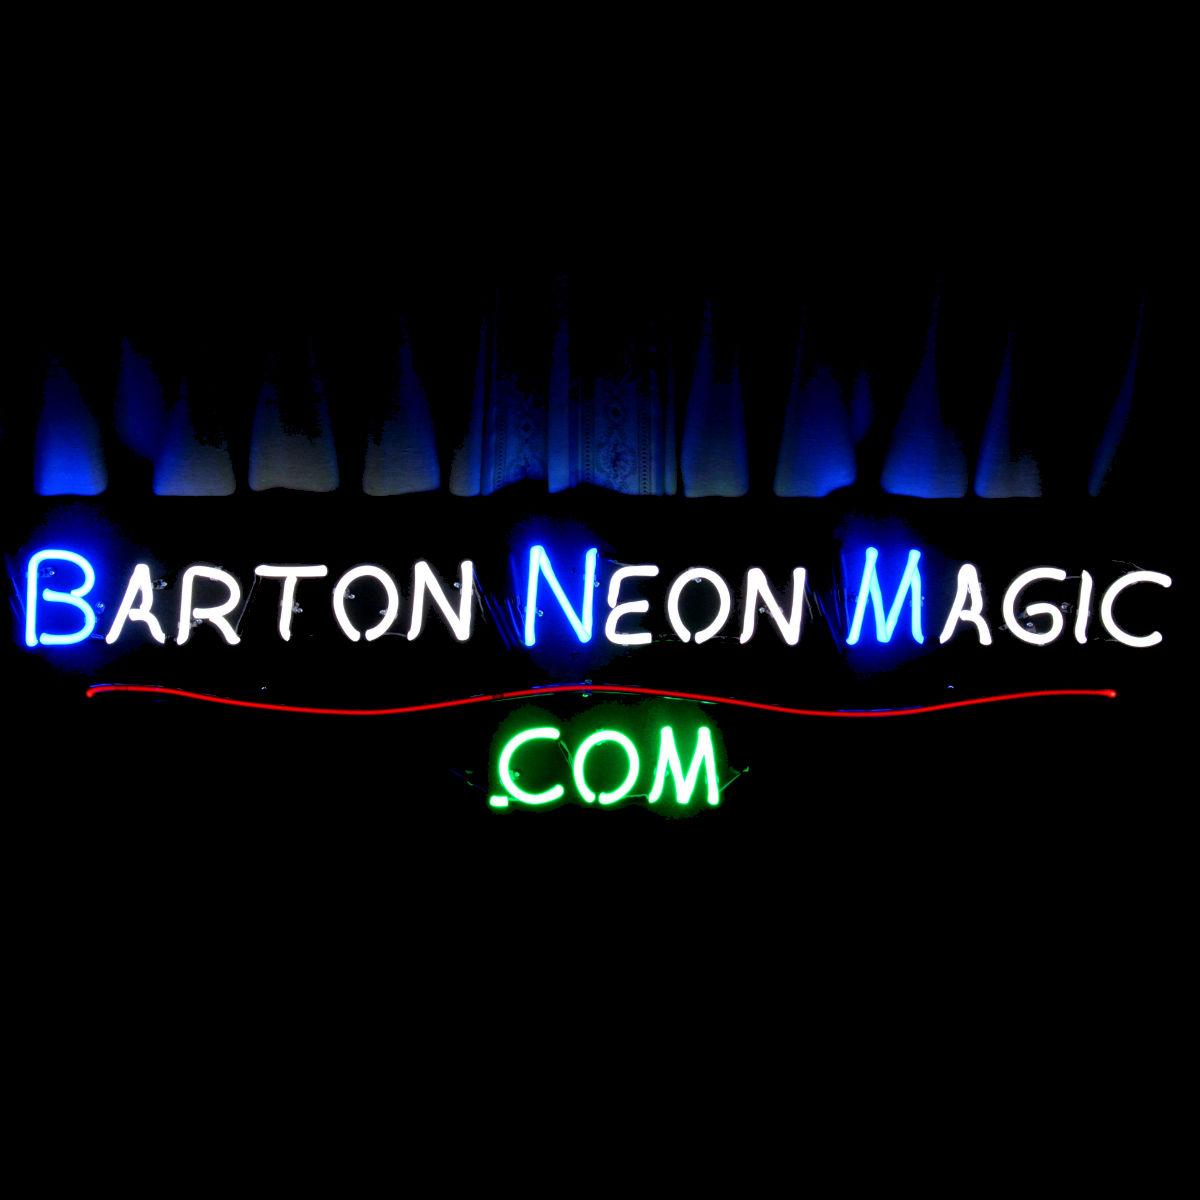 BartonNeonMagic.com - Fine Quality Designer Neon Lighting by John Barton - Famous USA Neon Glass Artist